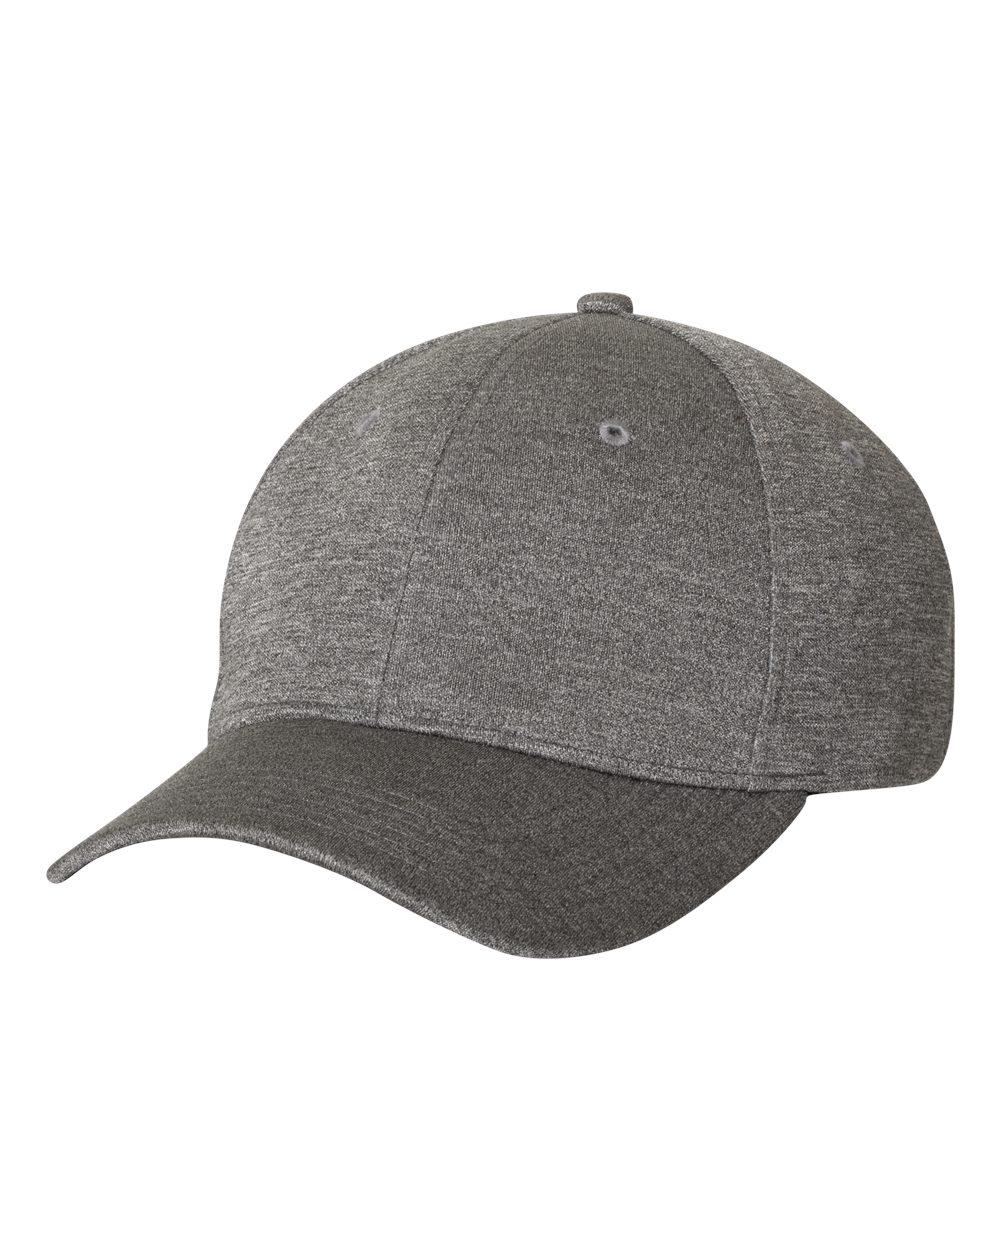 Sportsman 9300 - Marled Cap